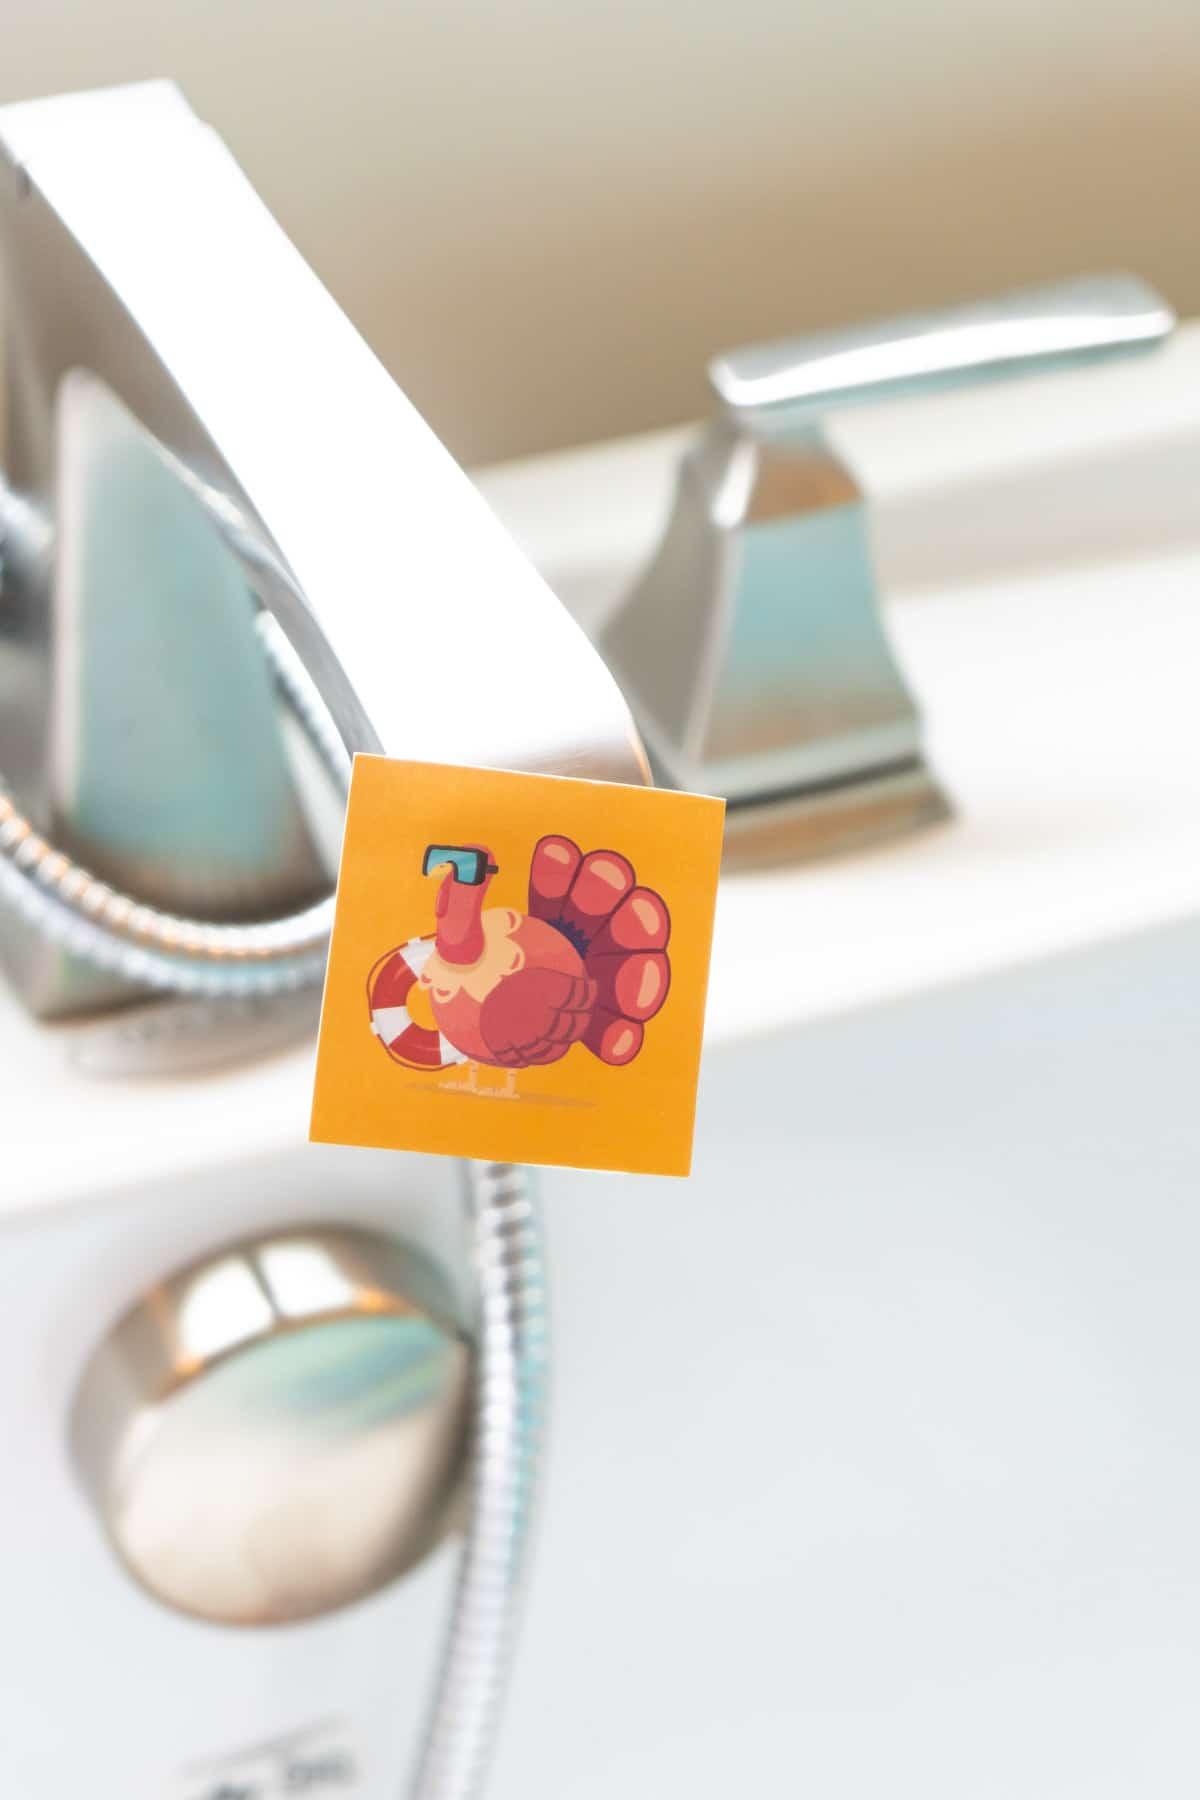 Turkey cutout on a bathtub faucet